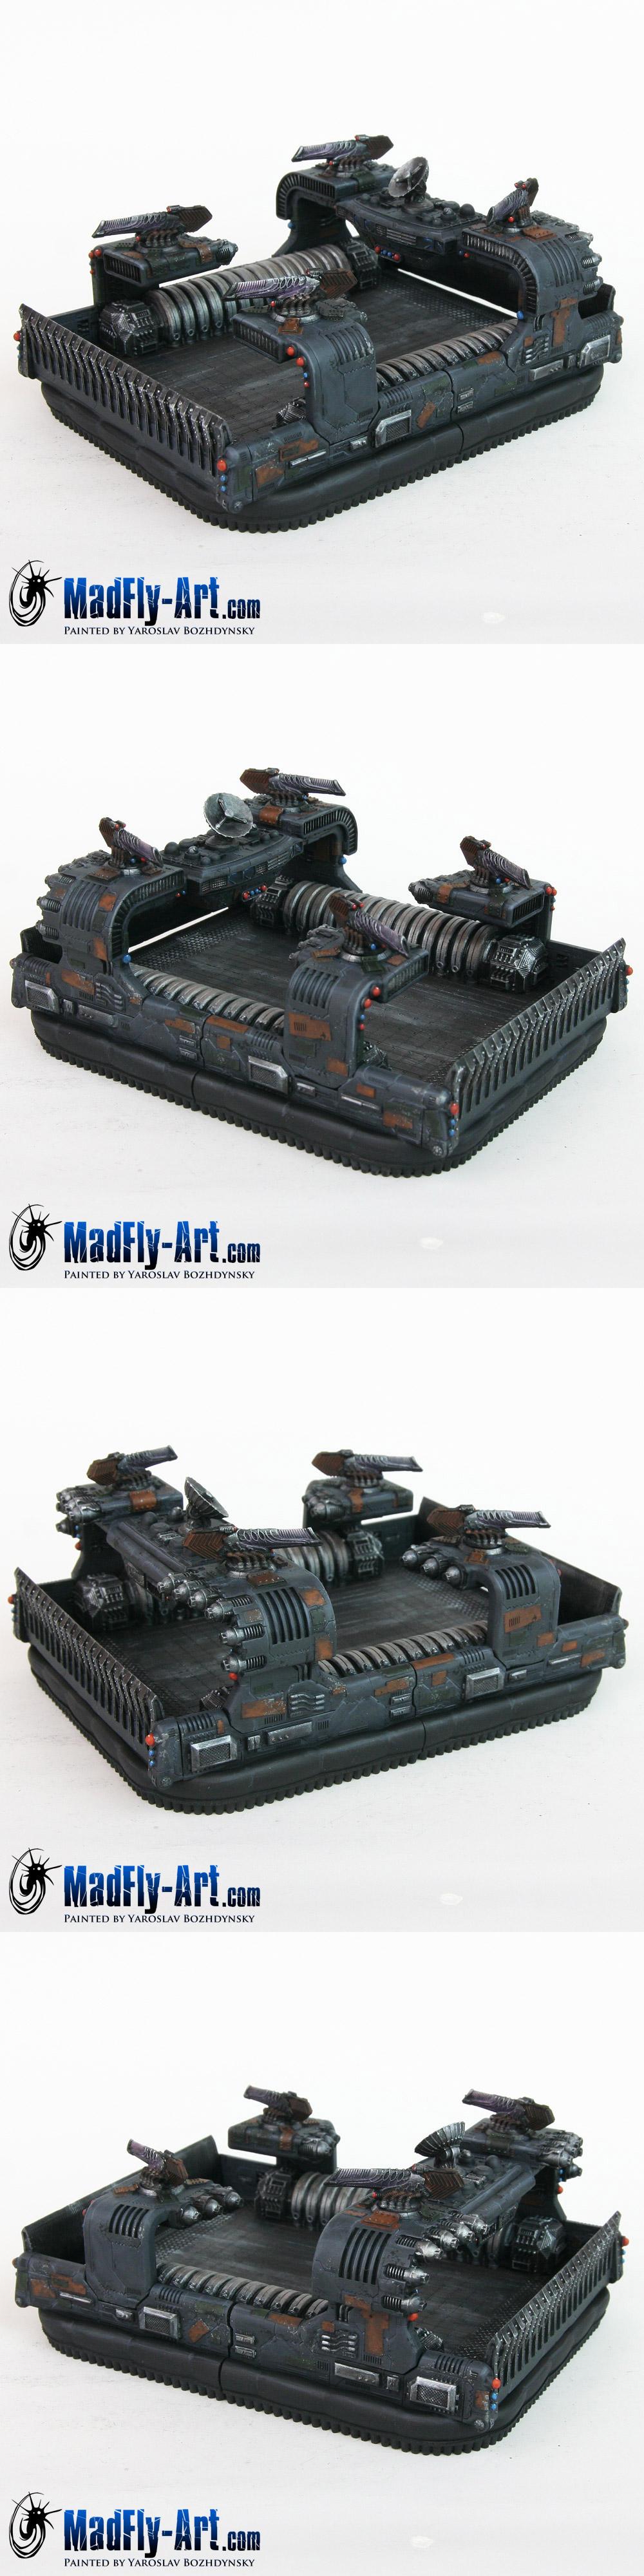 NT-5 Thunderstorm Custom